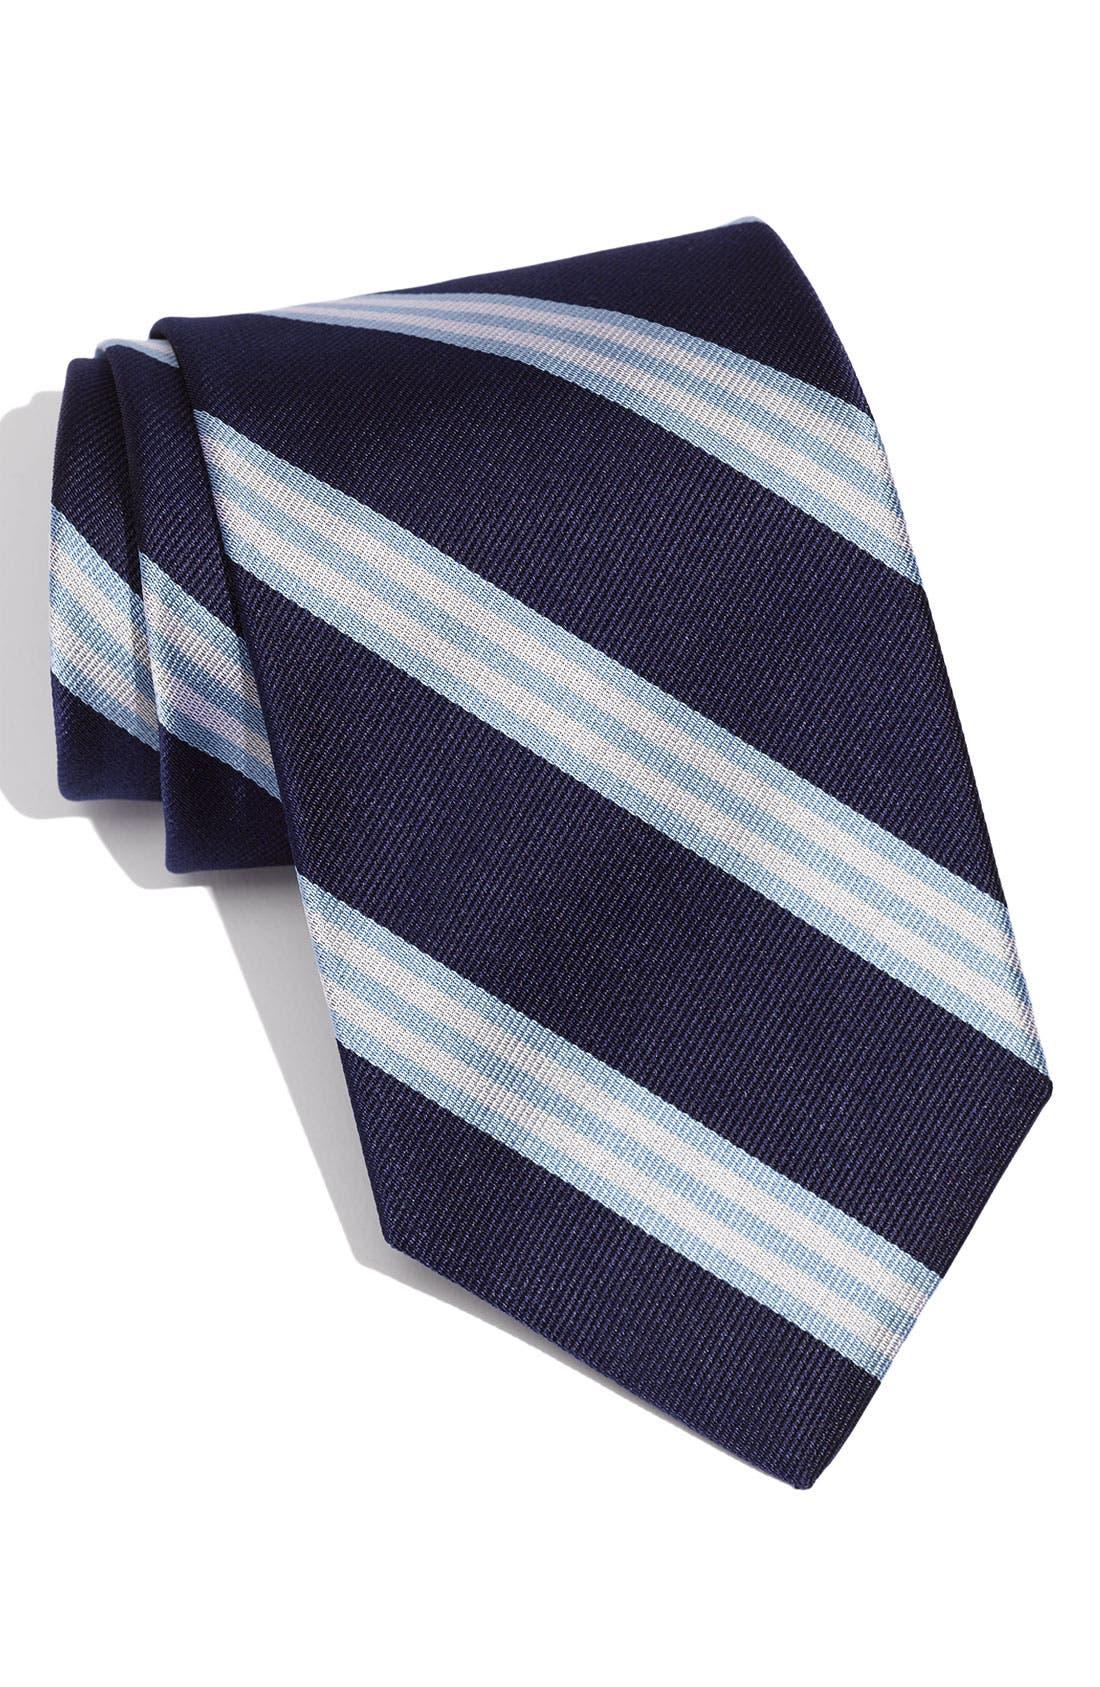 Main Image - Brooks Brothers Woven Silk Tie